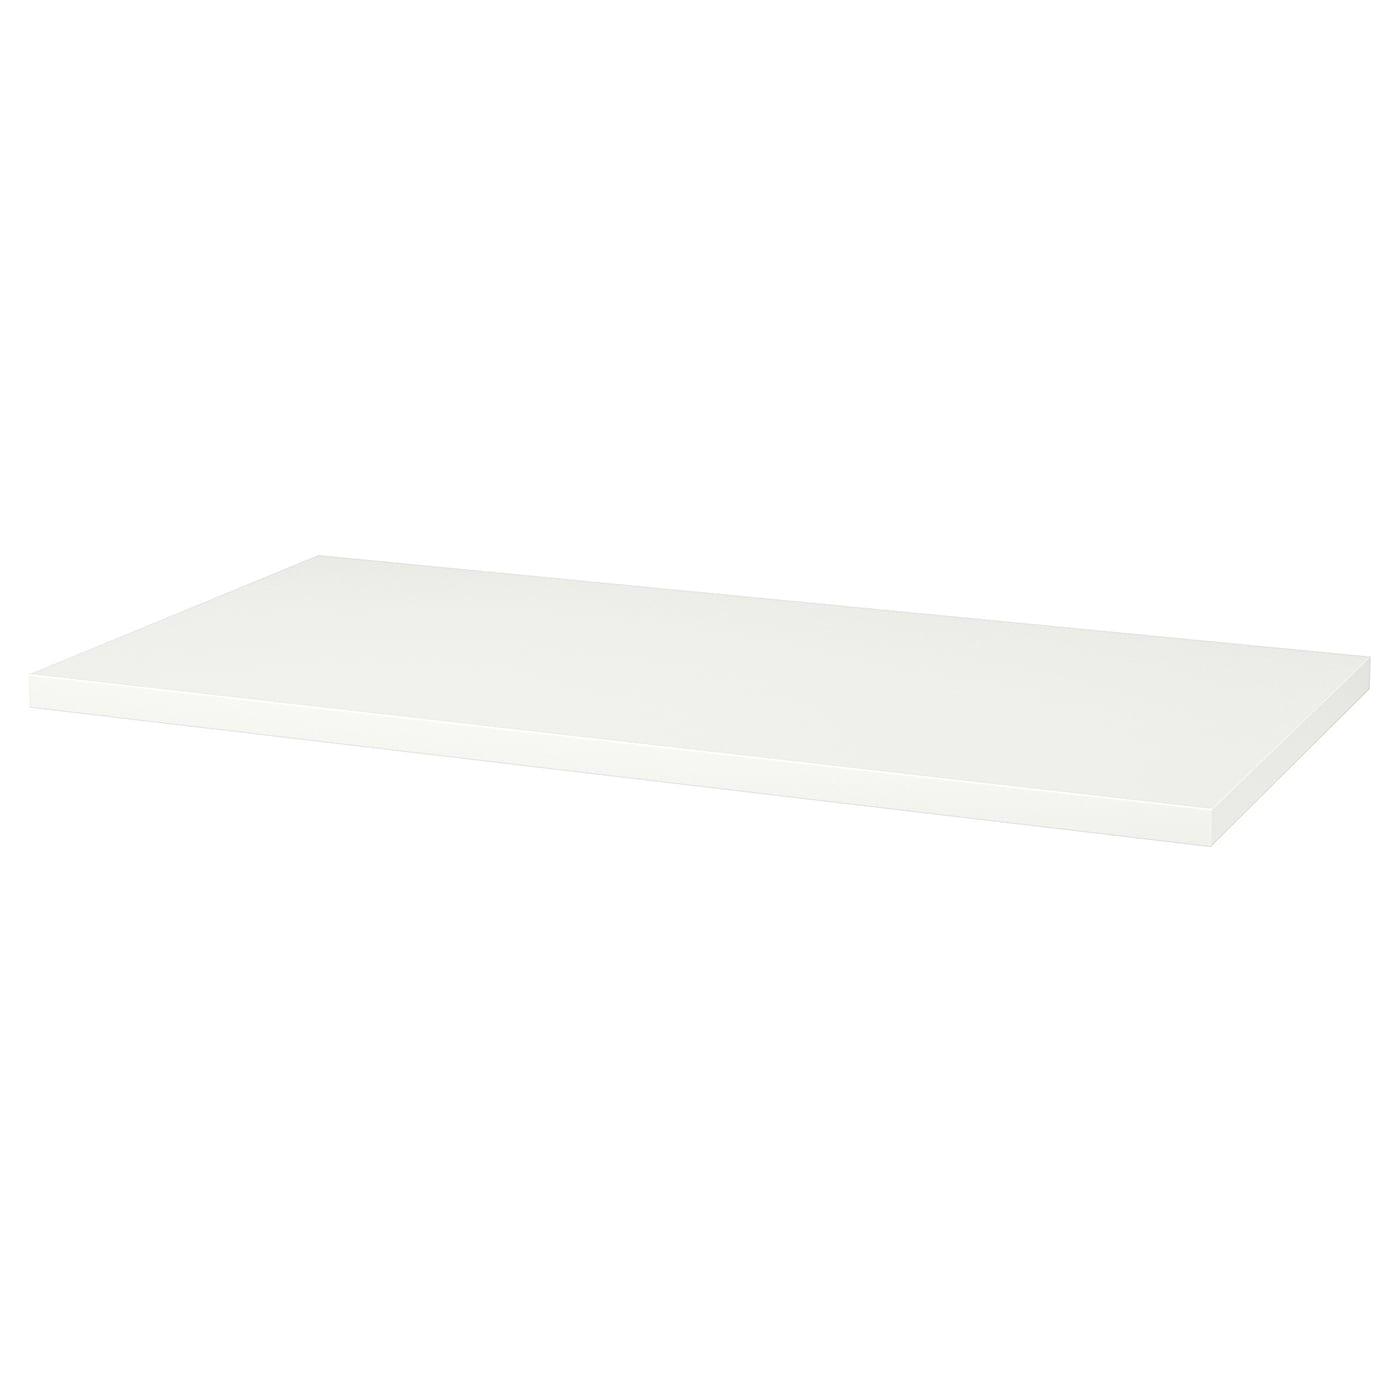 Table Tops Table Legs Trestles Table Bar System Ikea